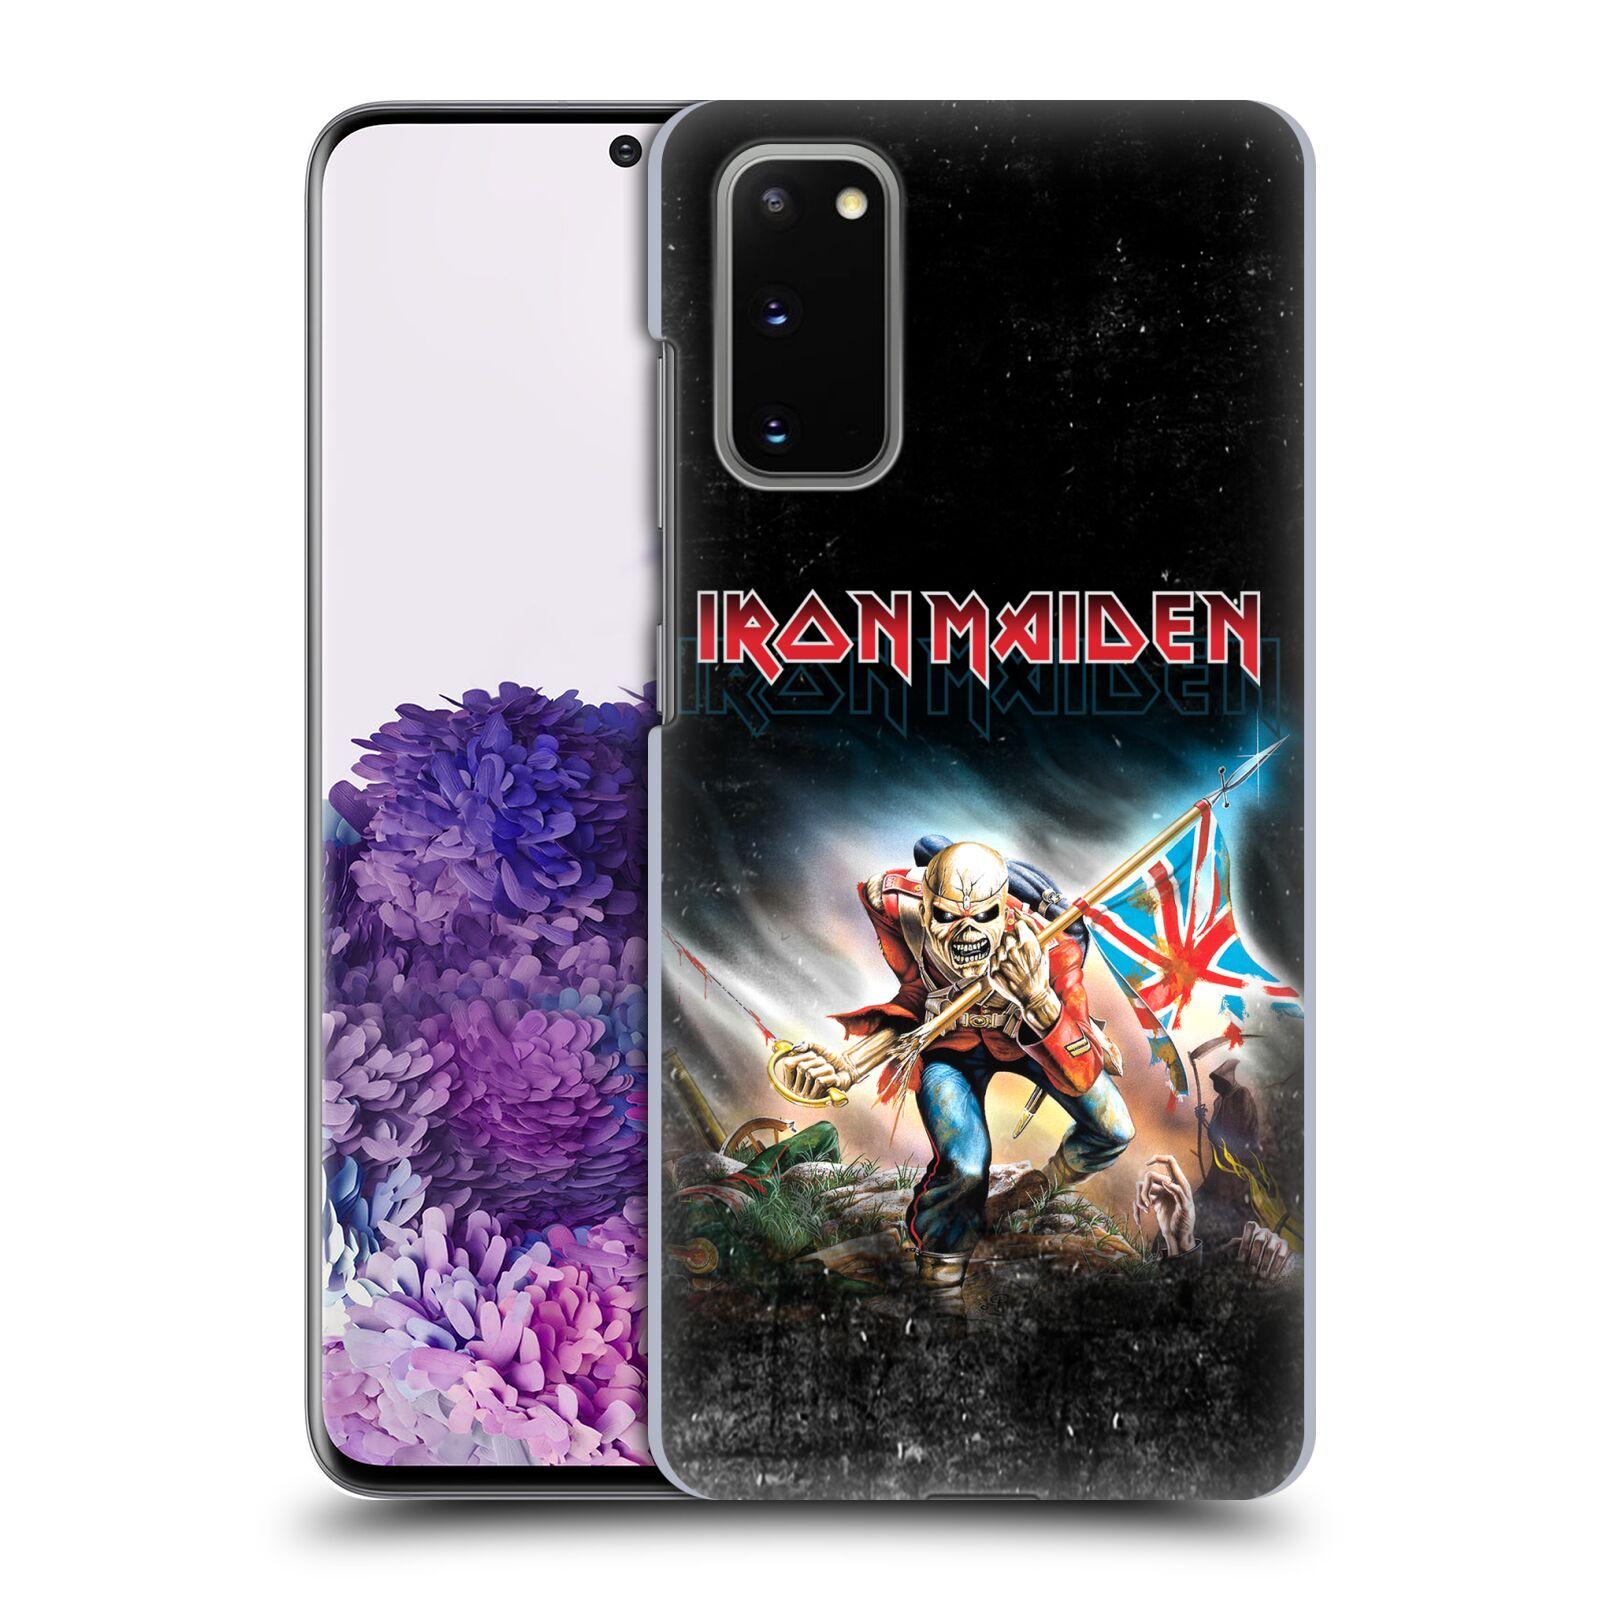 Plastové pouzdro na mobil Samsung Galaxy S20 - Head Case - Iron Maiden - Trooper 2016